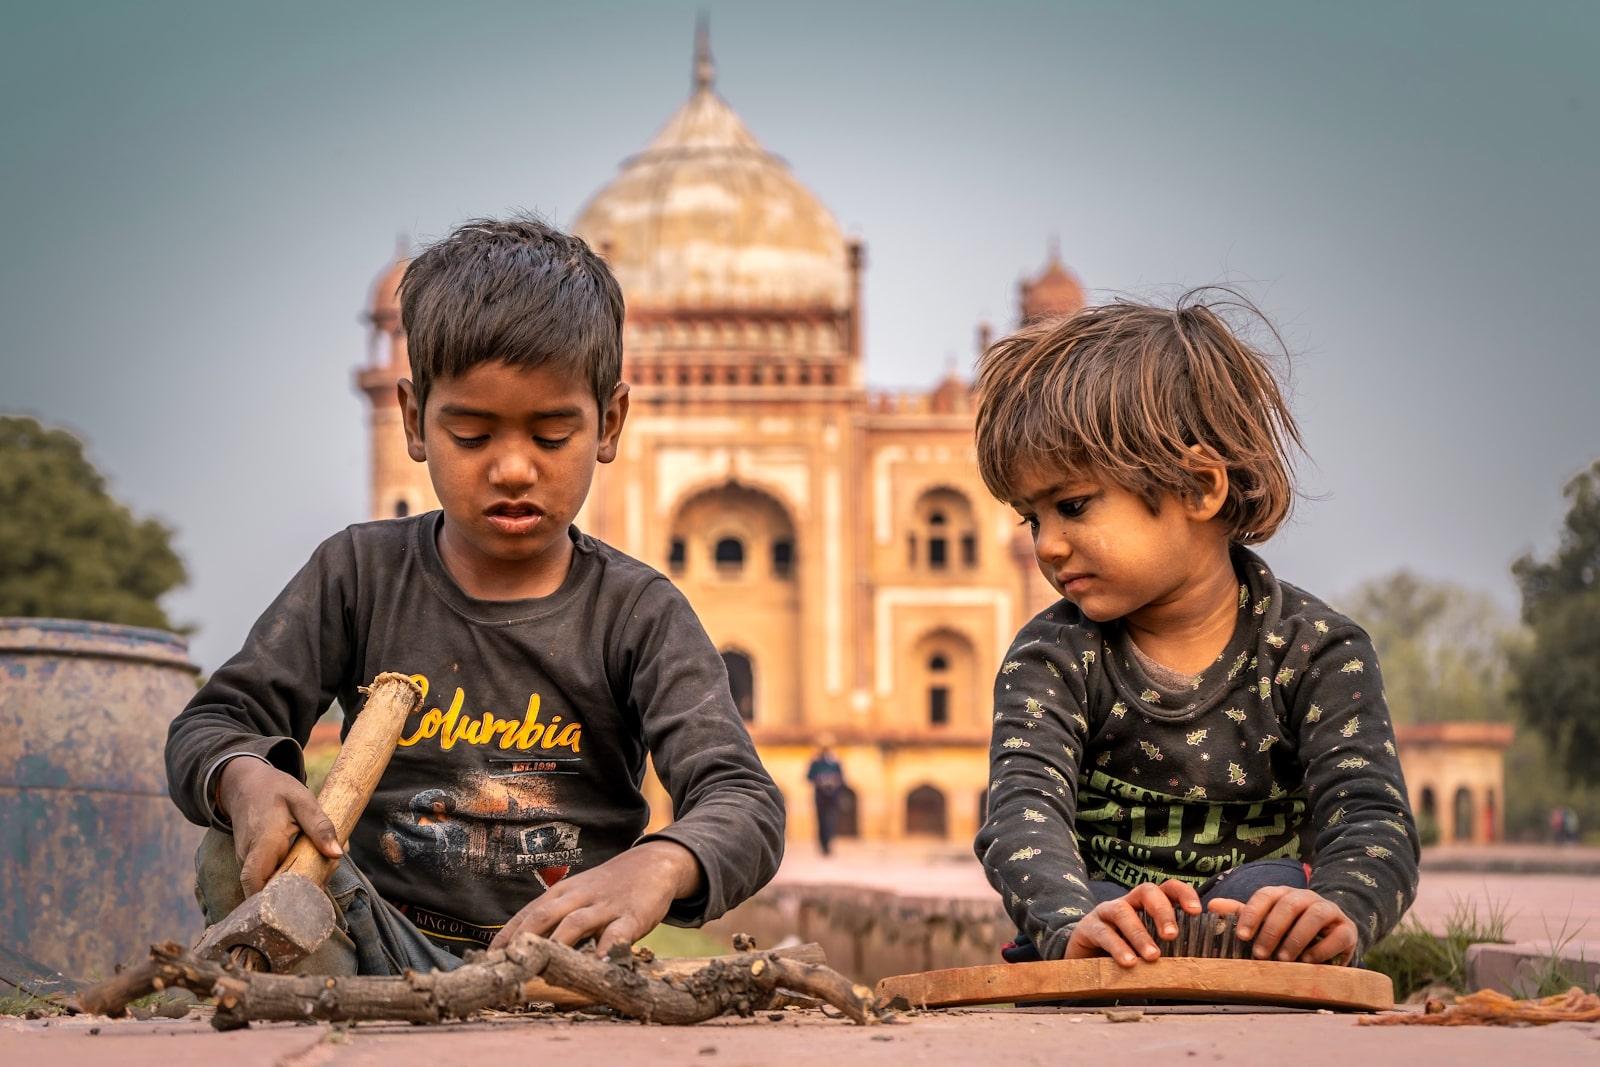 Poverty in India — A Representative Image